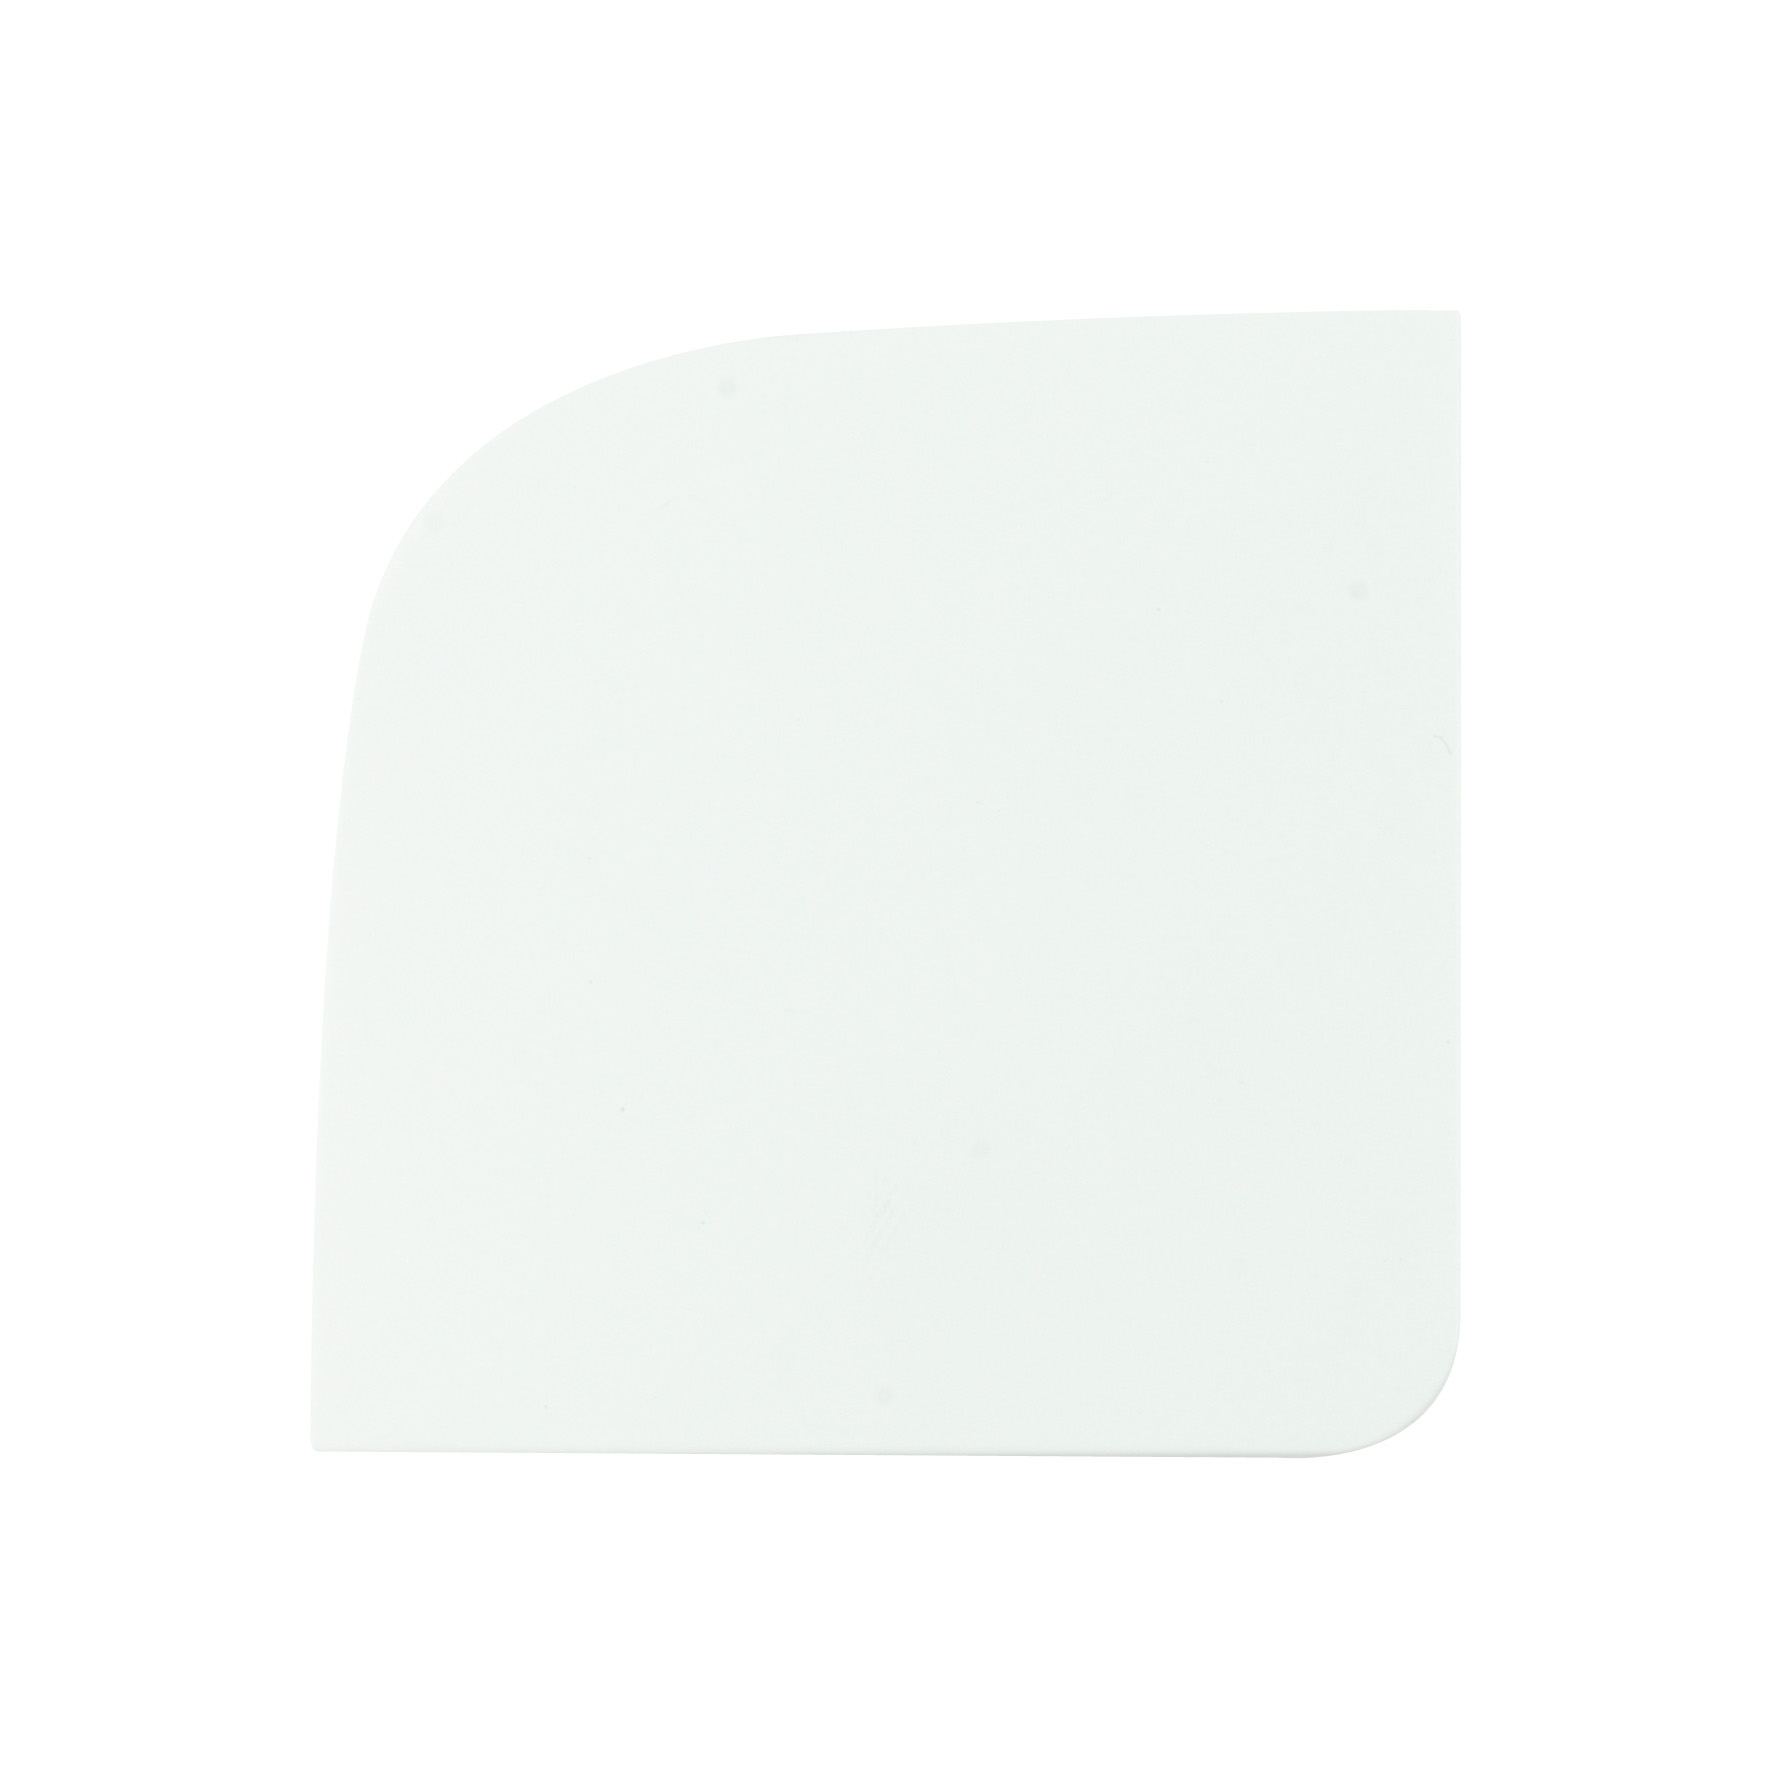 bianco_c_lineare